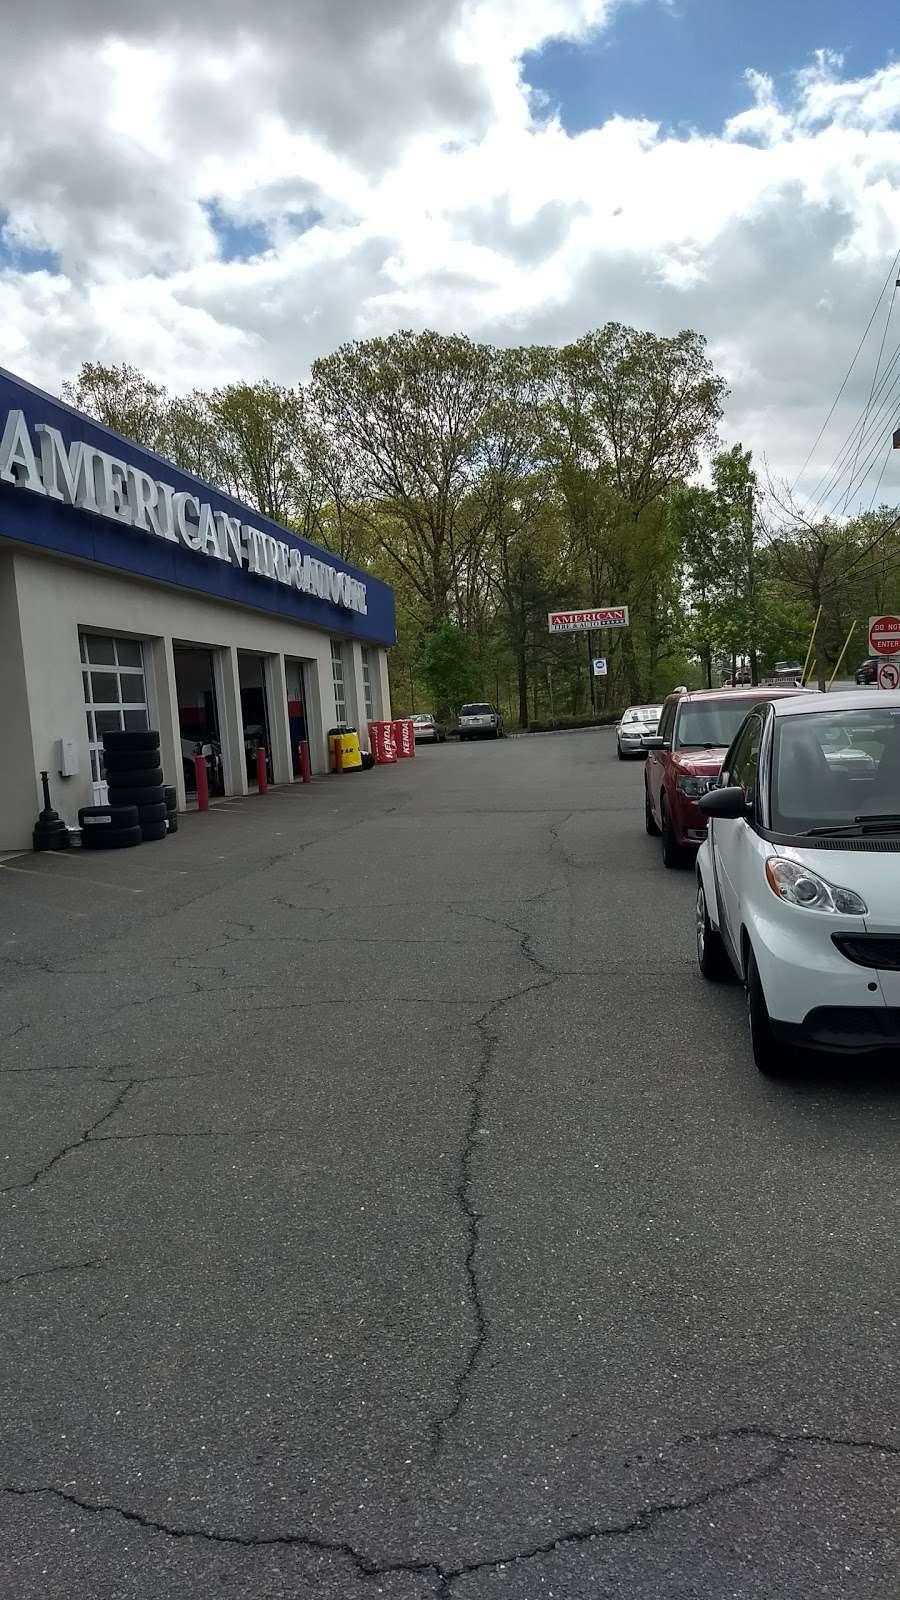 American Tire & Auto Care - car repair  | Photo 6 of 10 | Address: 2302 County Rd 516, Old Bridge, NJ 08857, USA | Phone: (732) 210-6444